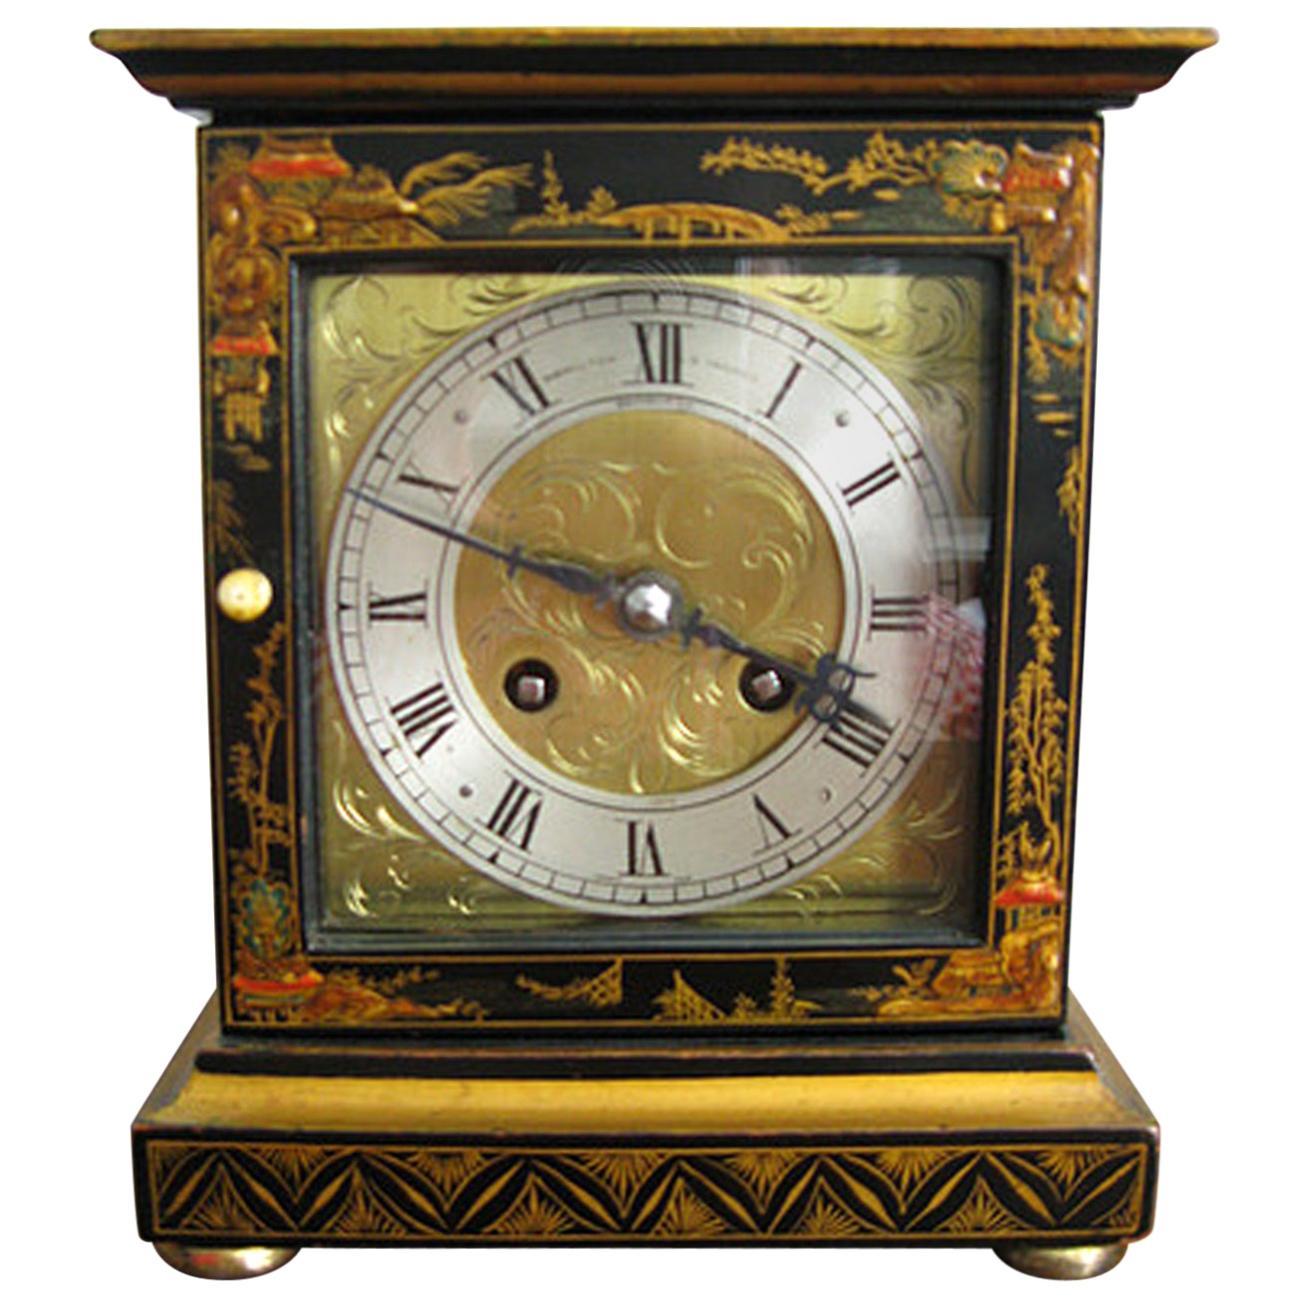 Black Chinoiserie Chiming Mantel Clock Hamilton & Inches Edinburgh